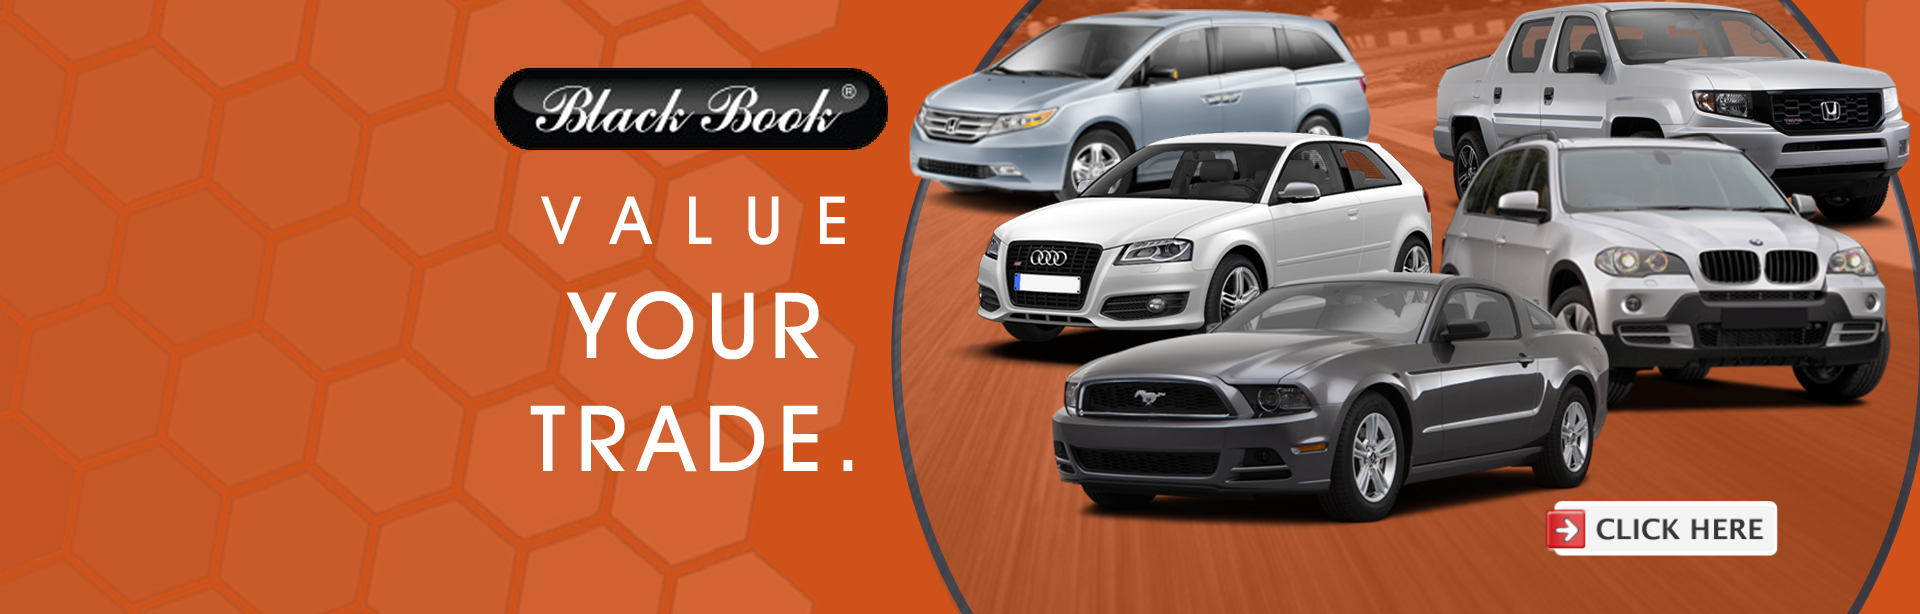 Black Book - Bay Automotive - Norfolk VA